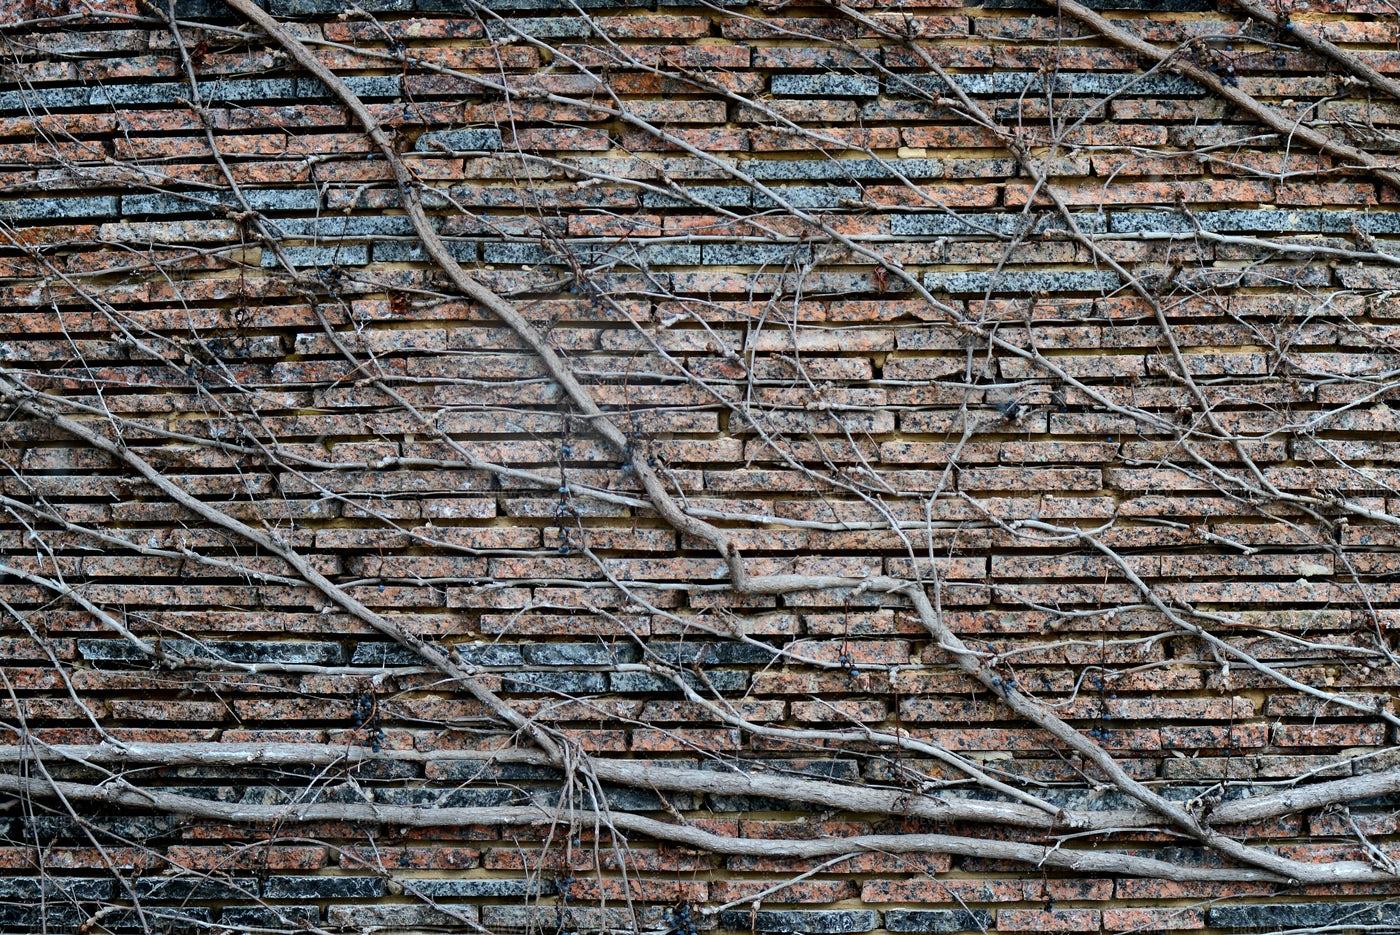 Tree Growing Along A Wall: Stock Photos